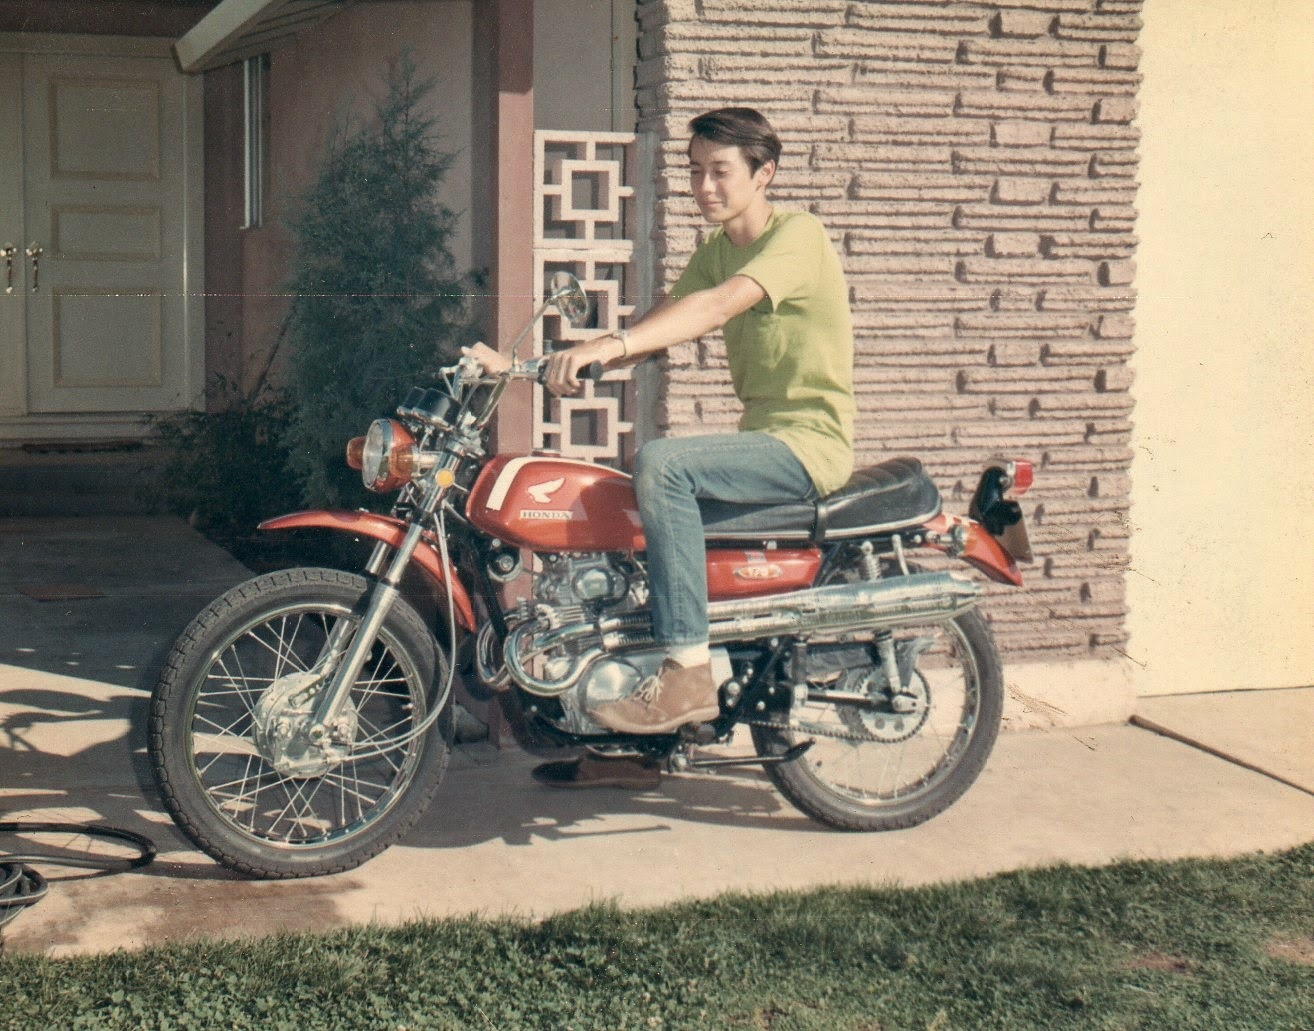 1969 CL 175 K3